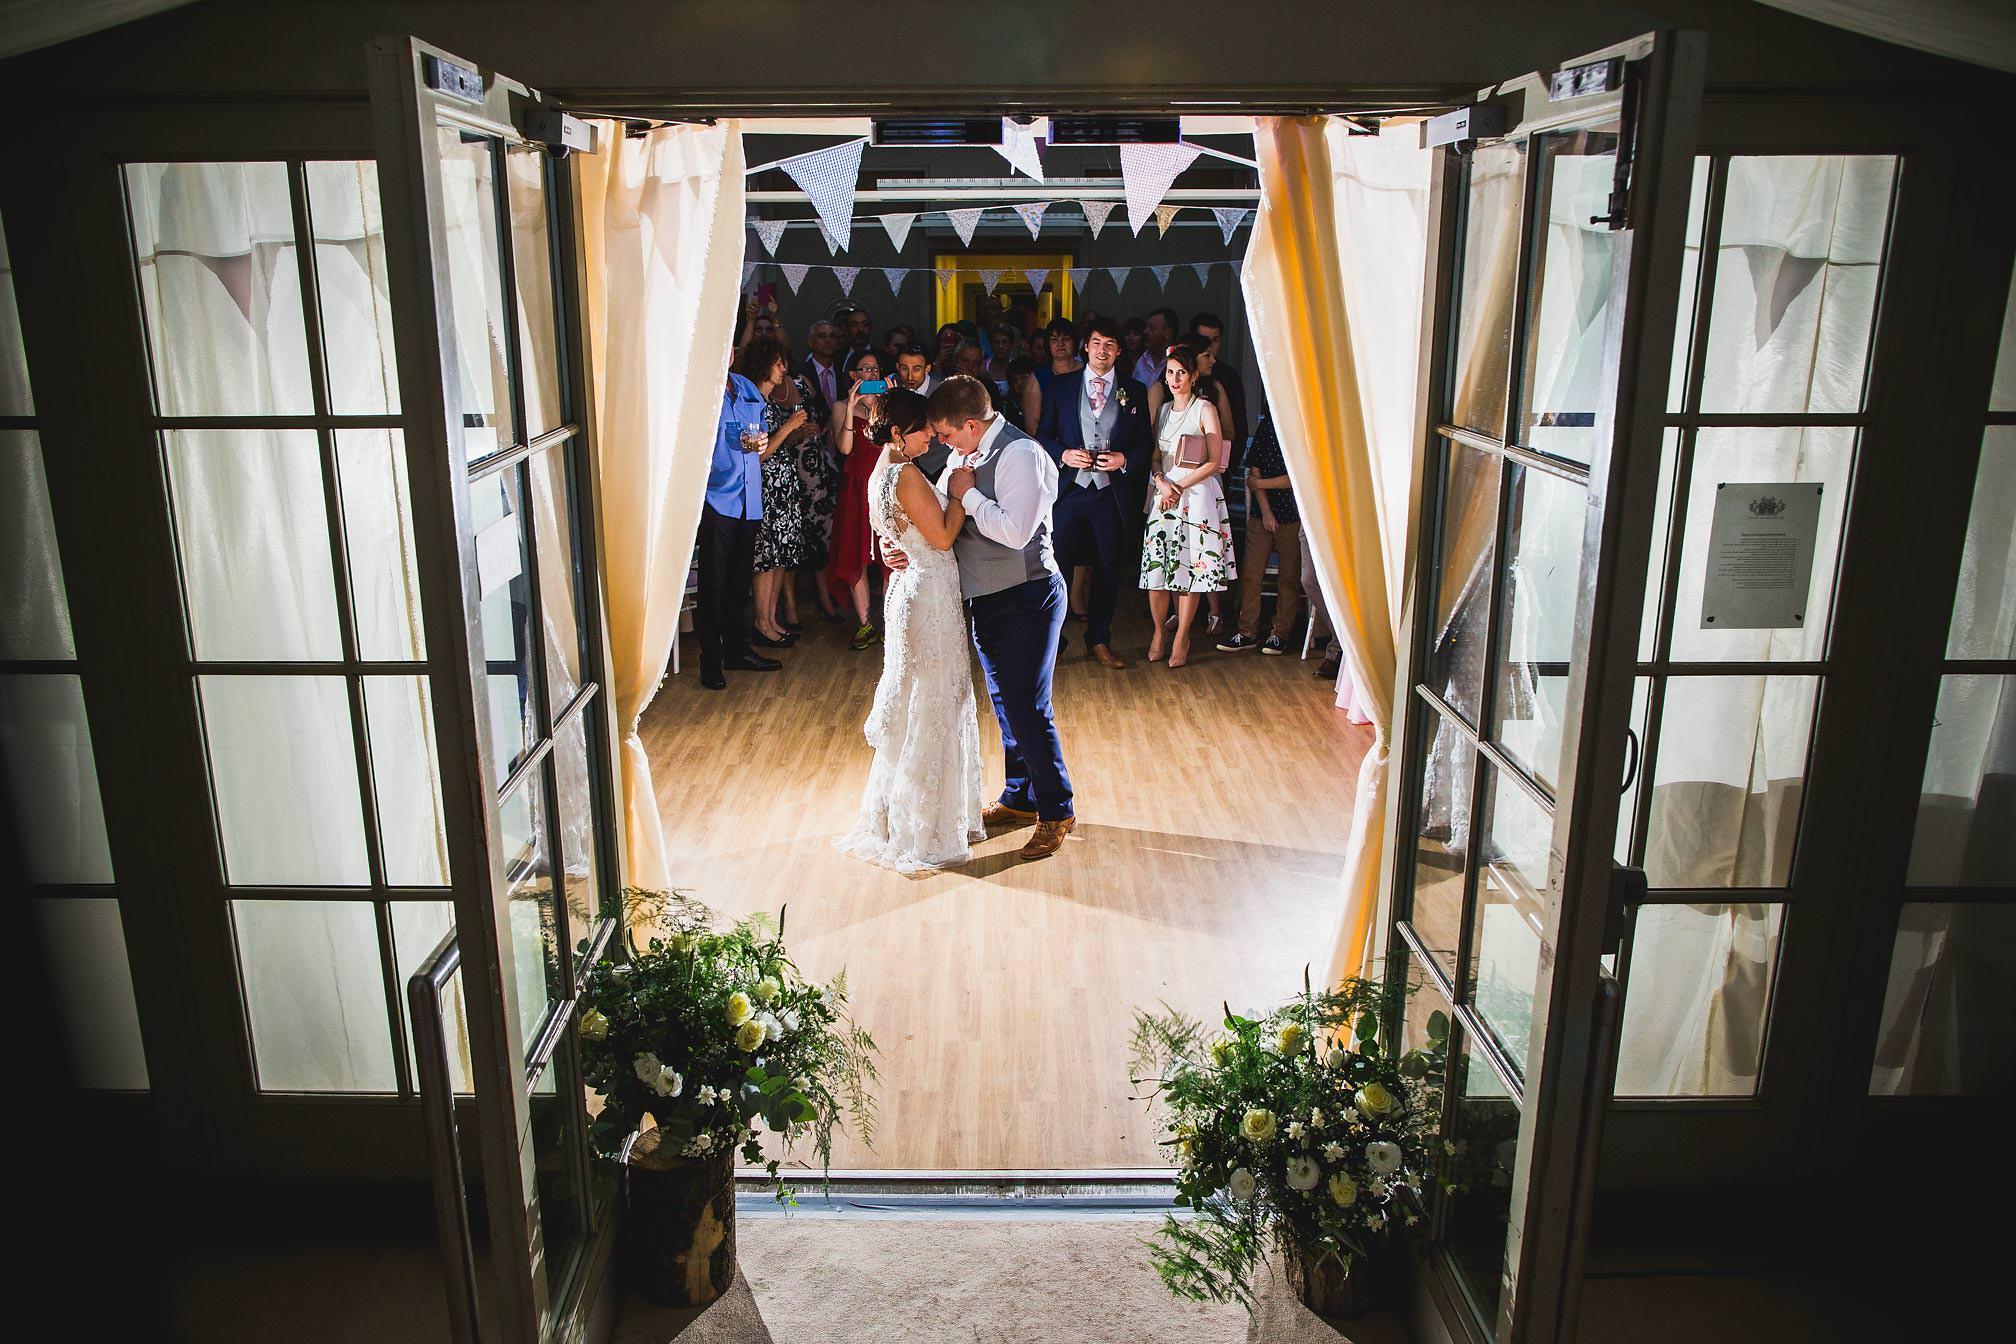 Rangefinder Magazine 30 Rising Stars of Wedding Photography 2016 - 28